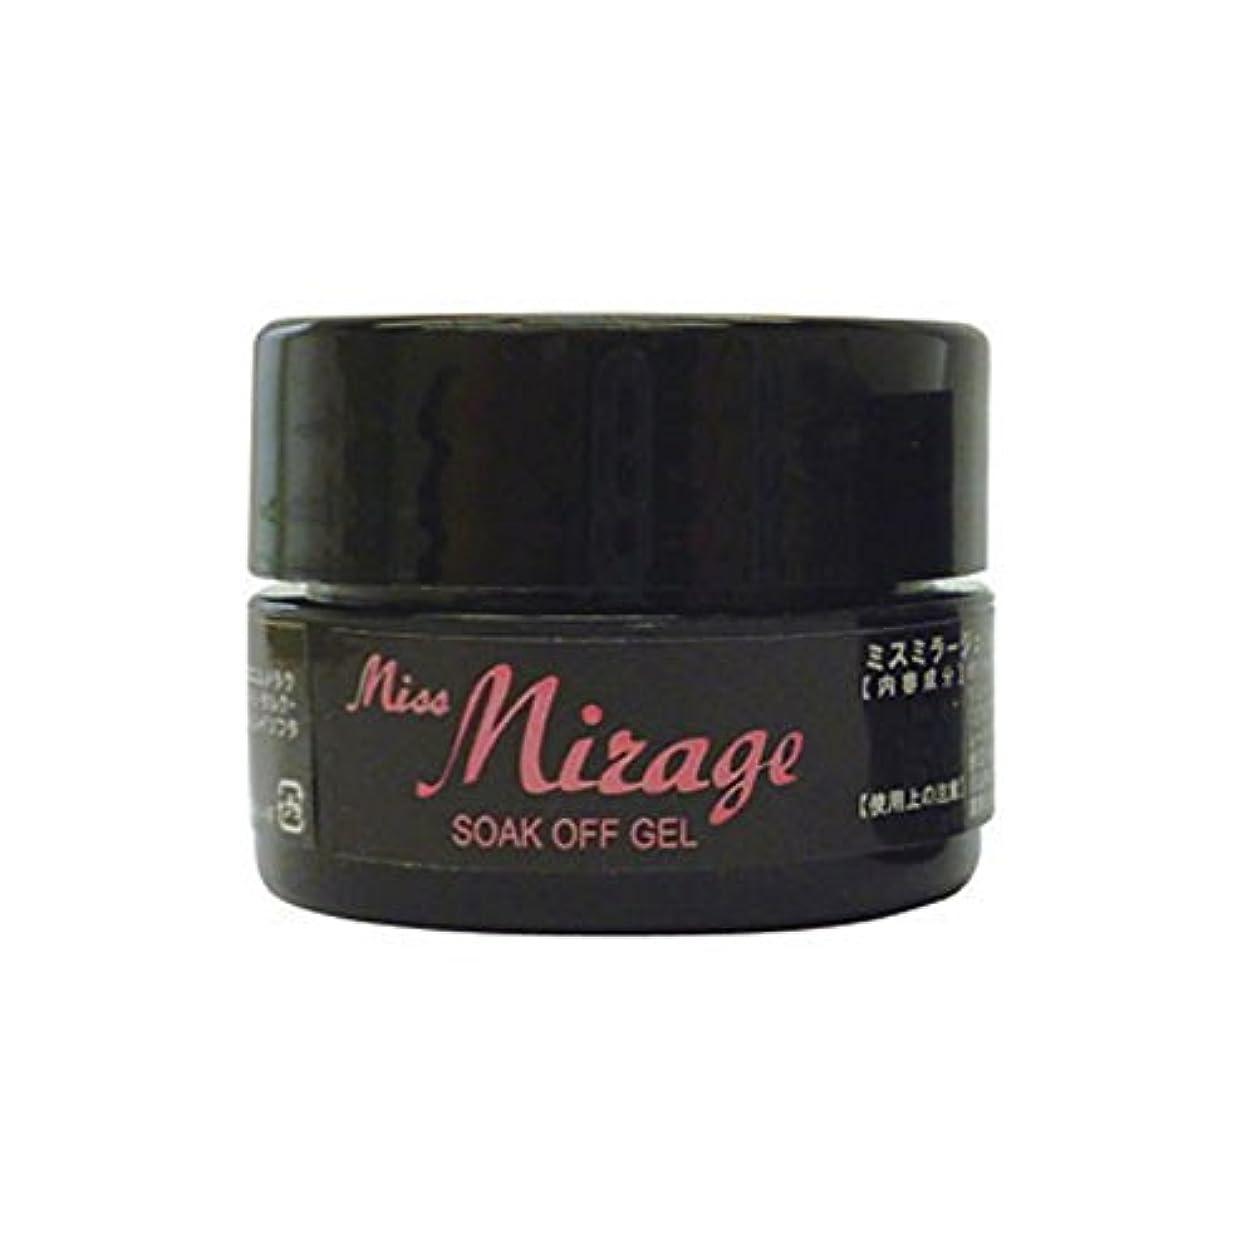 Miss Mirage カラージェル PG17 2.5g ソークオフジェル UV/LED対応